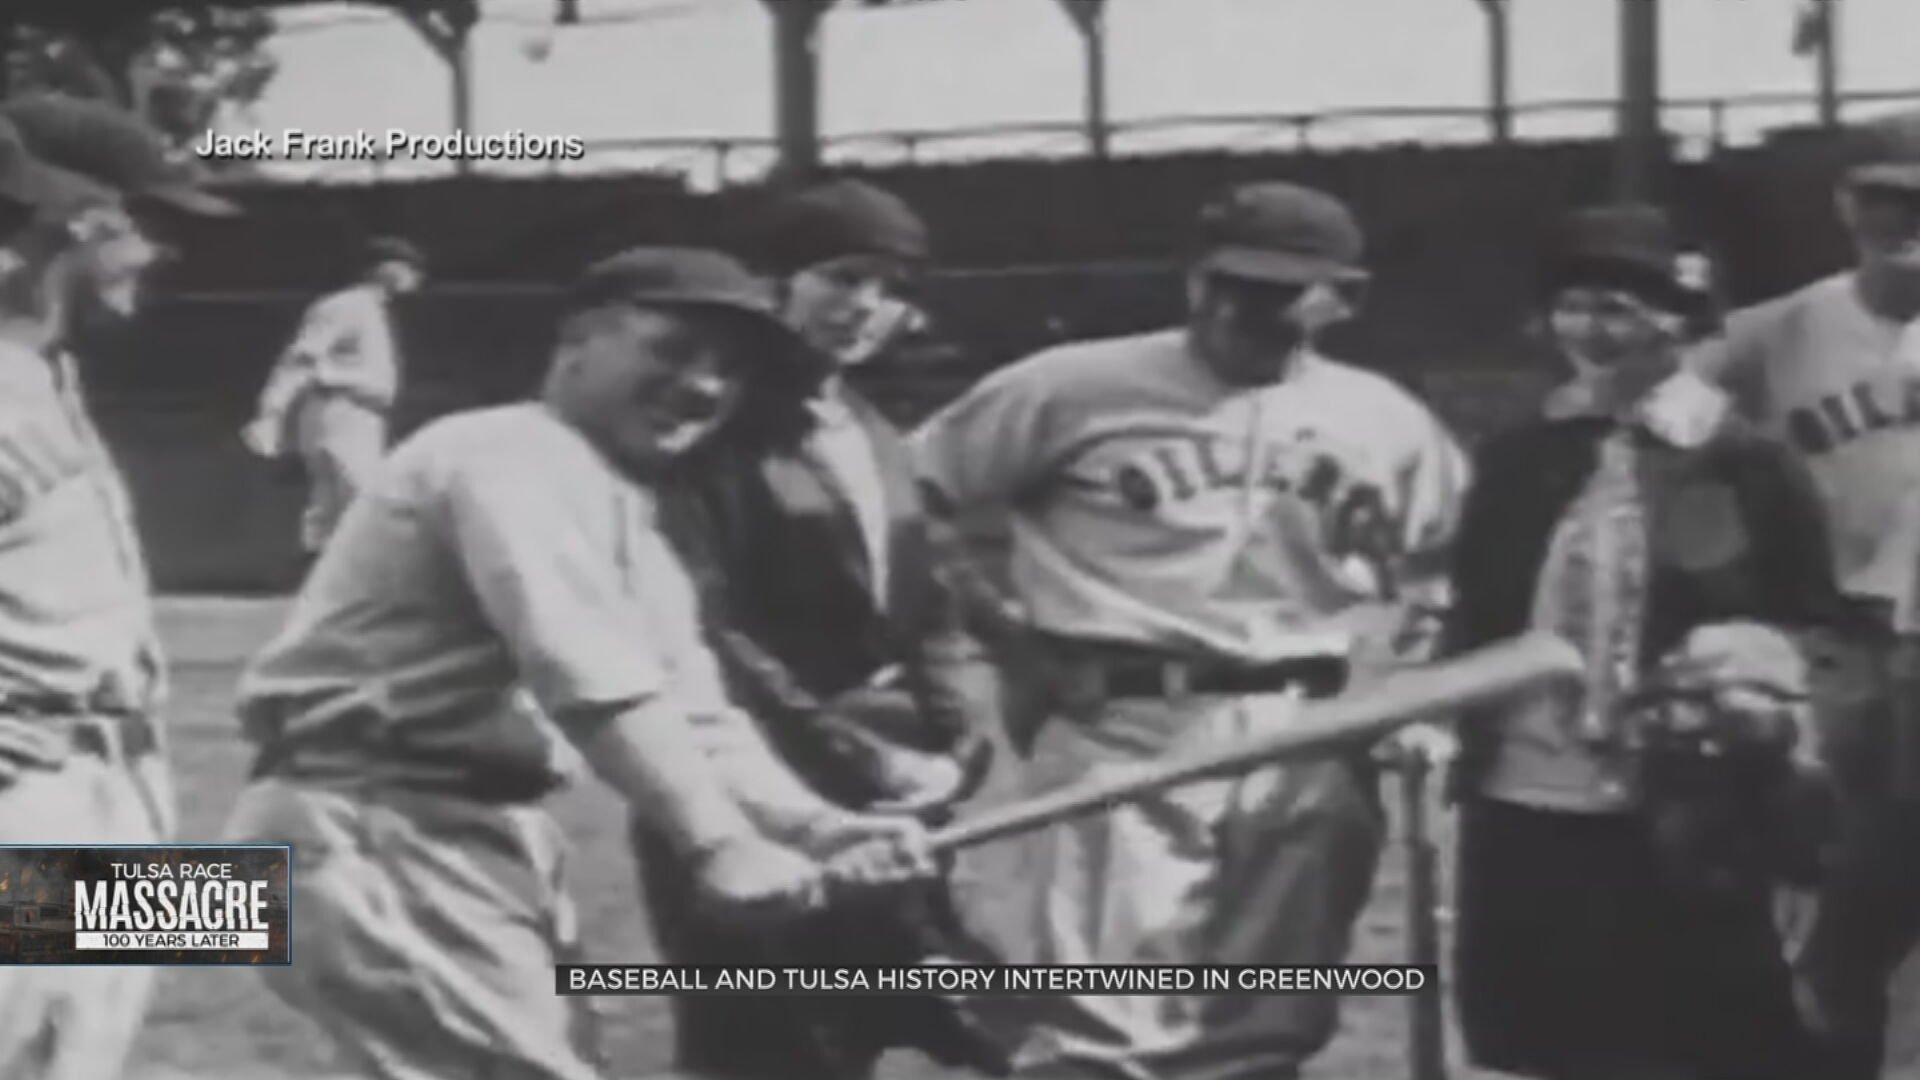 Baseball & Tulsa History Intertwined In Greenwood